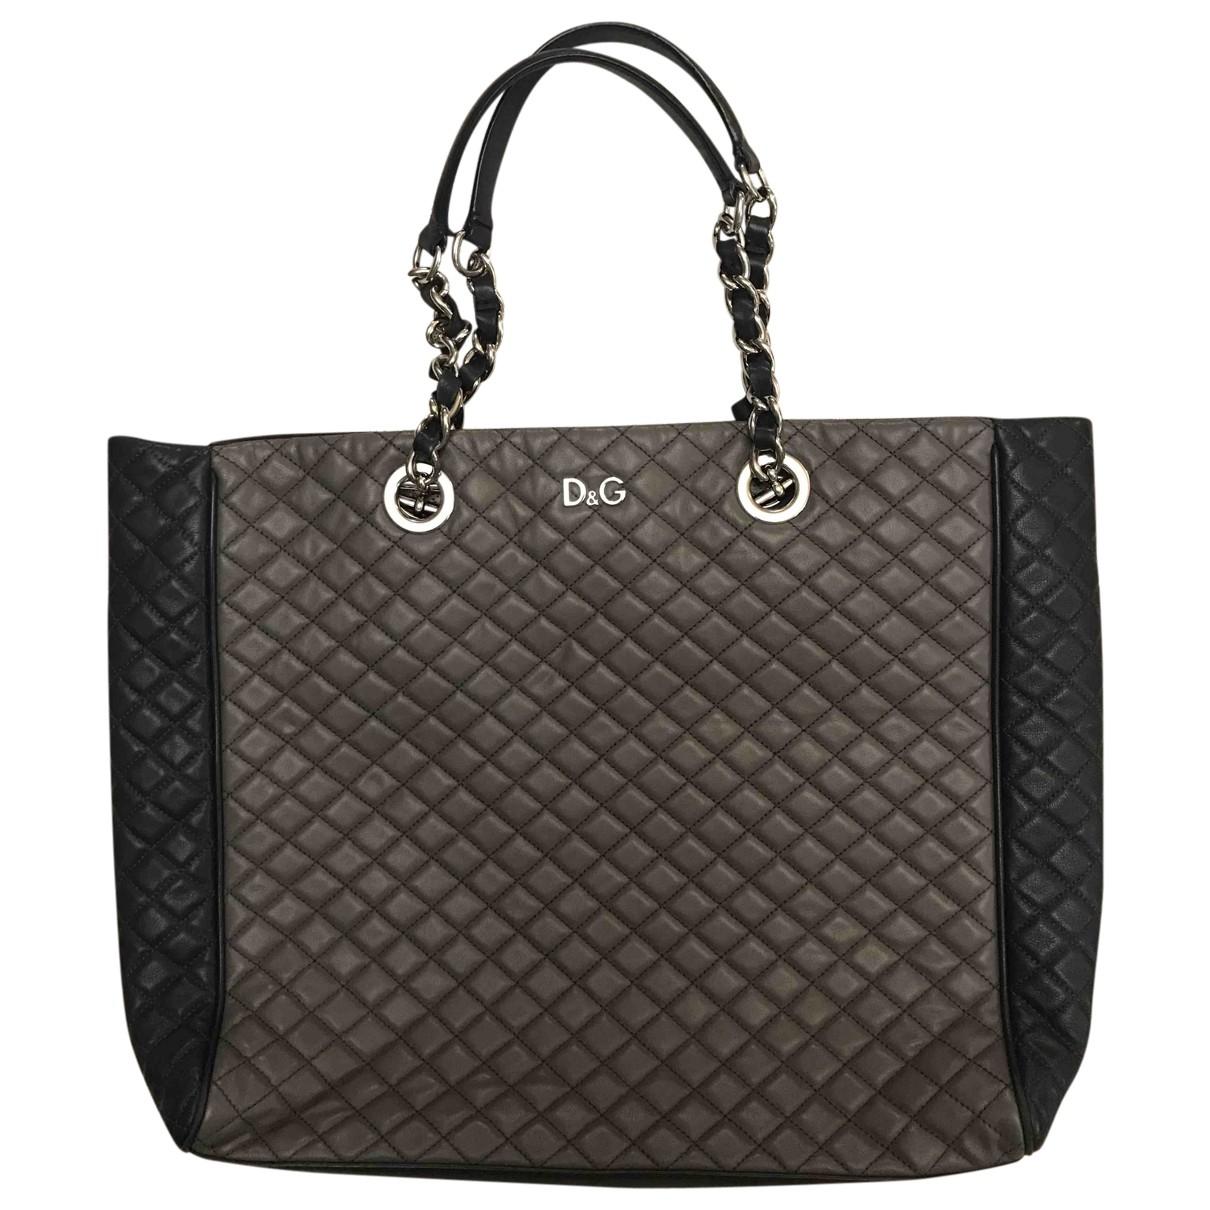 D&g \N Handtasche in  Grau Leder